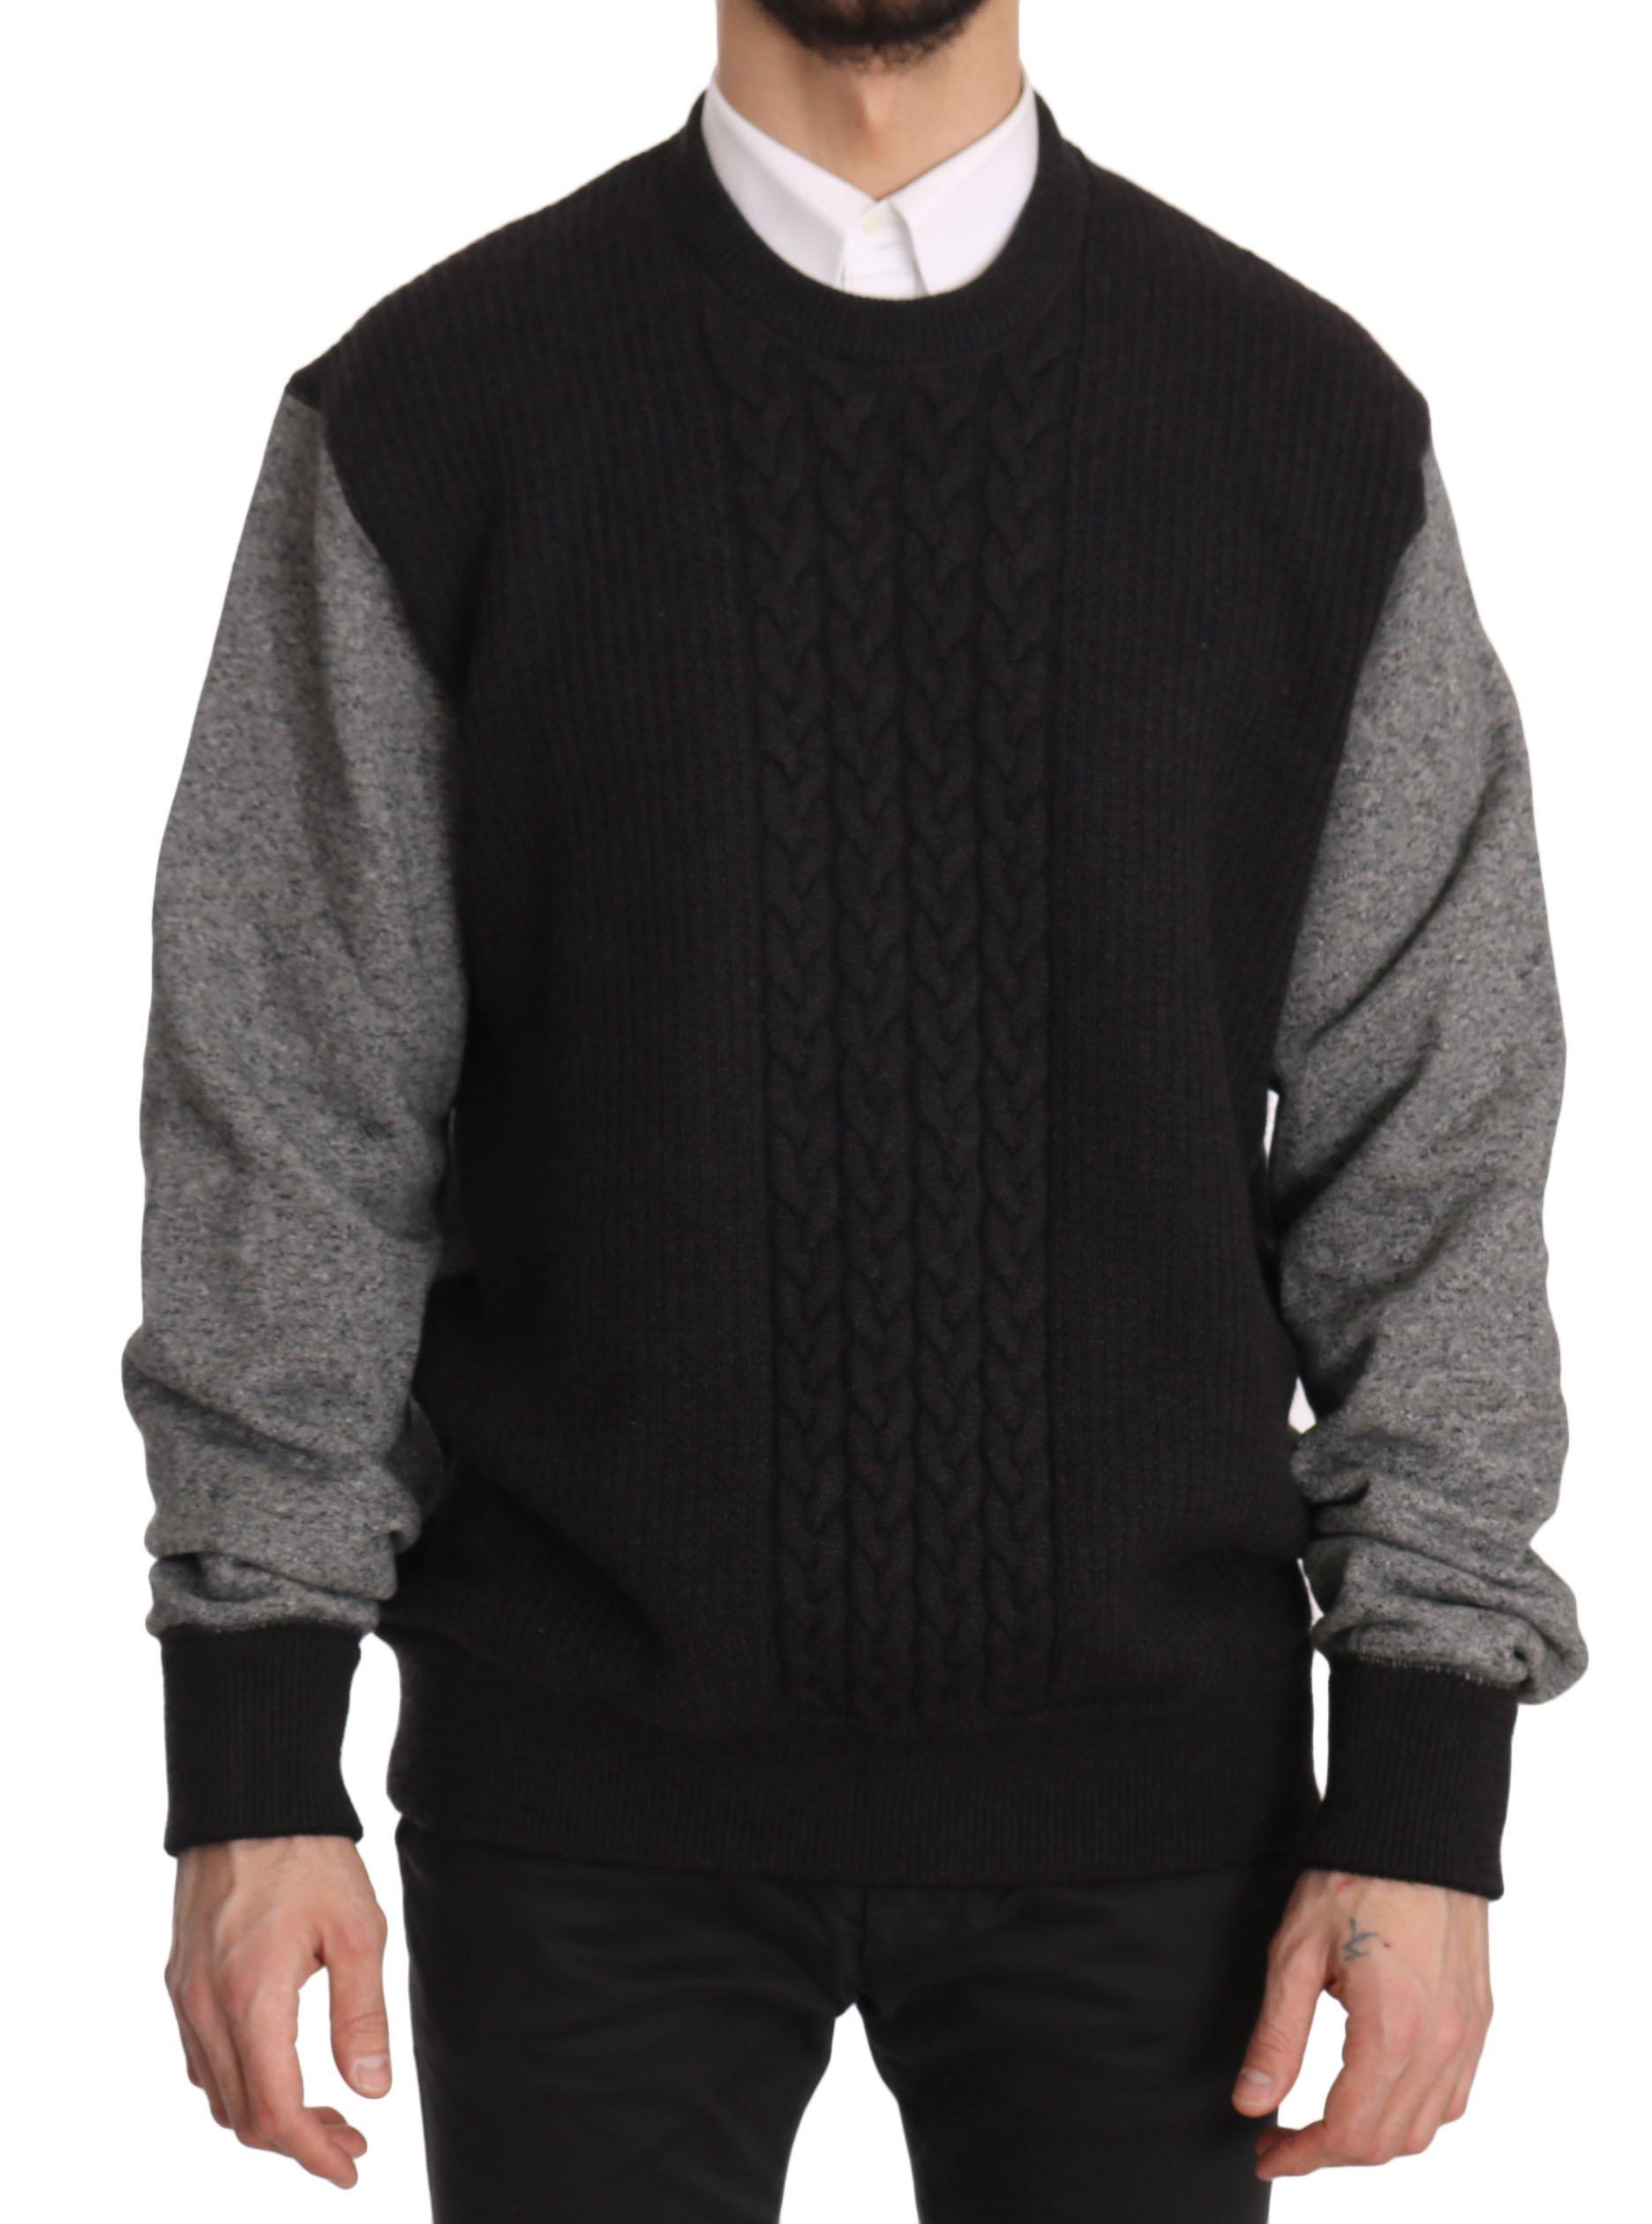 Dolce & Gabbana Men's Sweater Black and Gray TSH3581 - IT56 | XXL